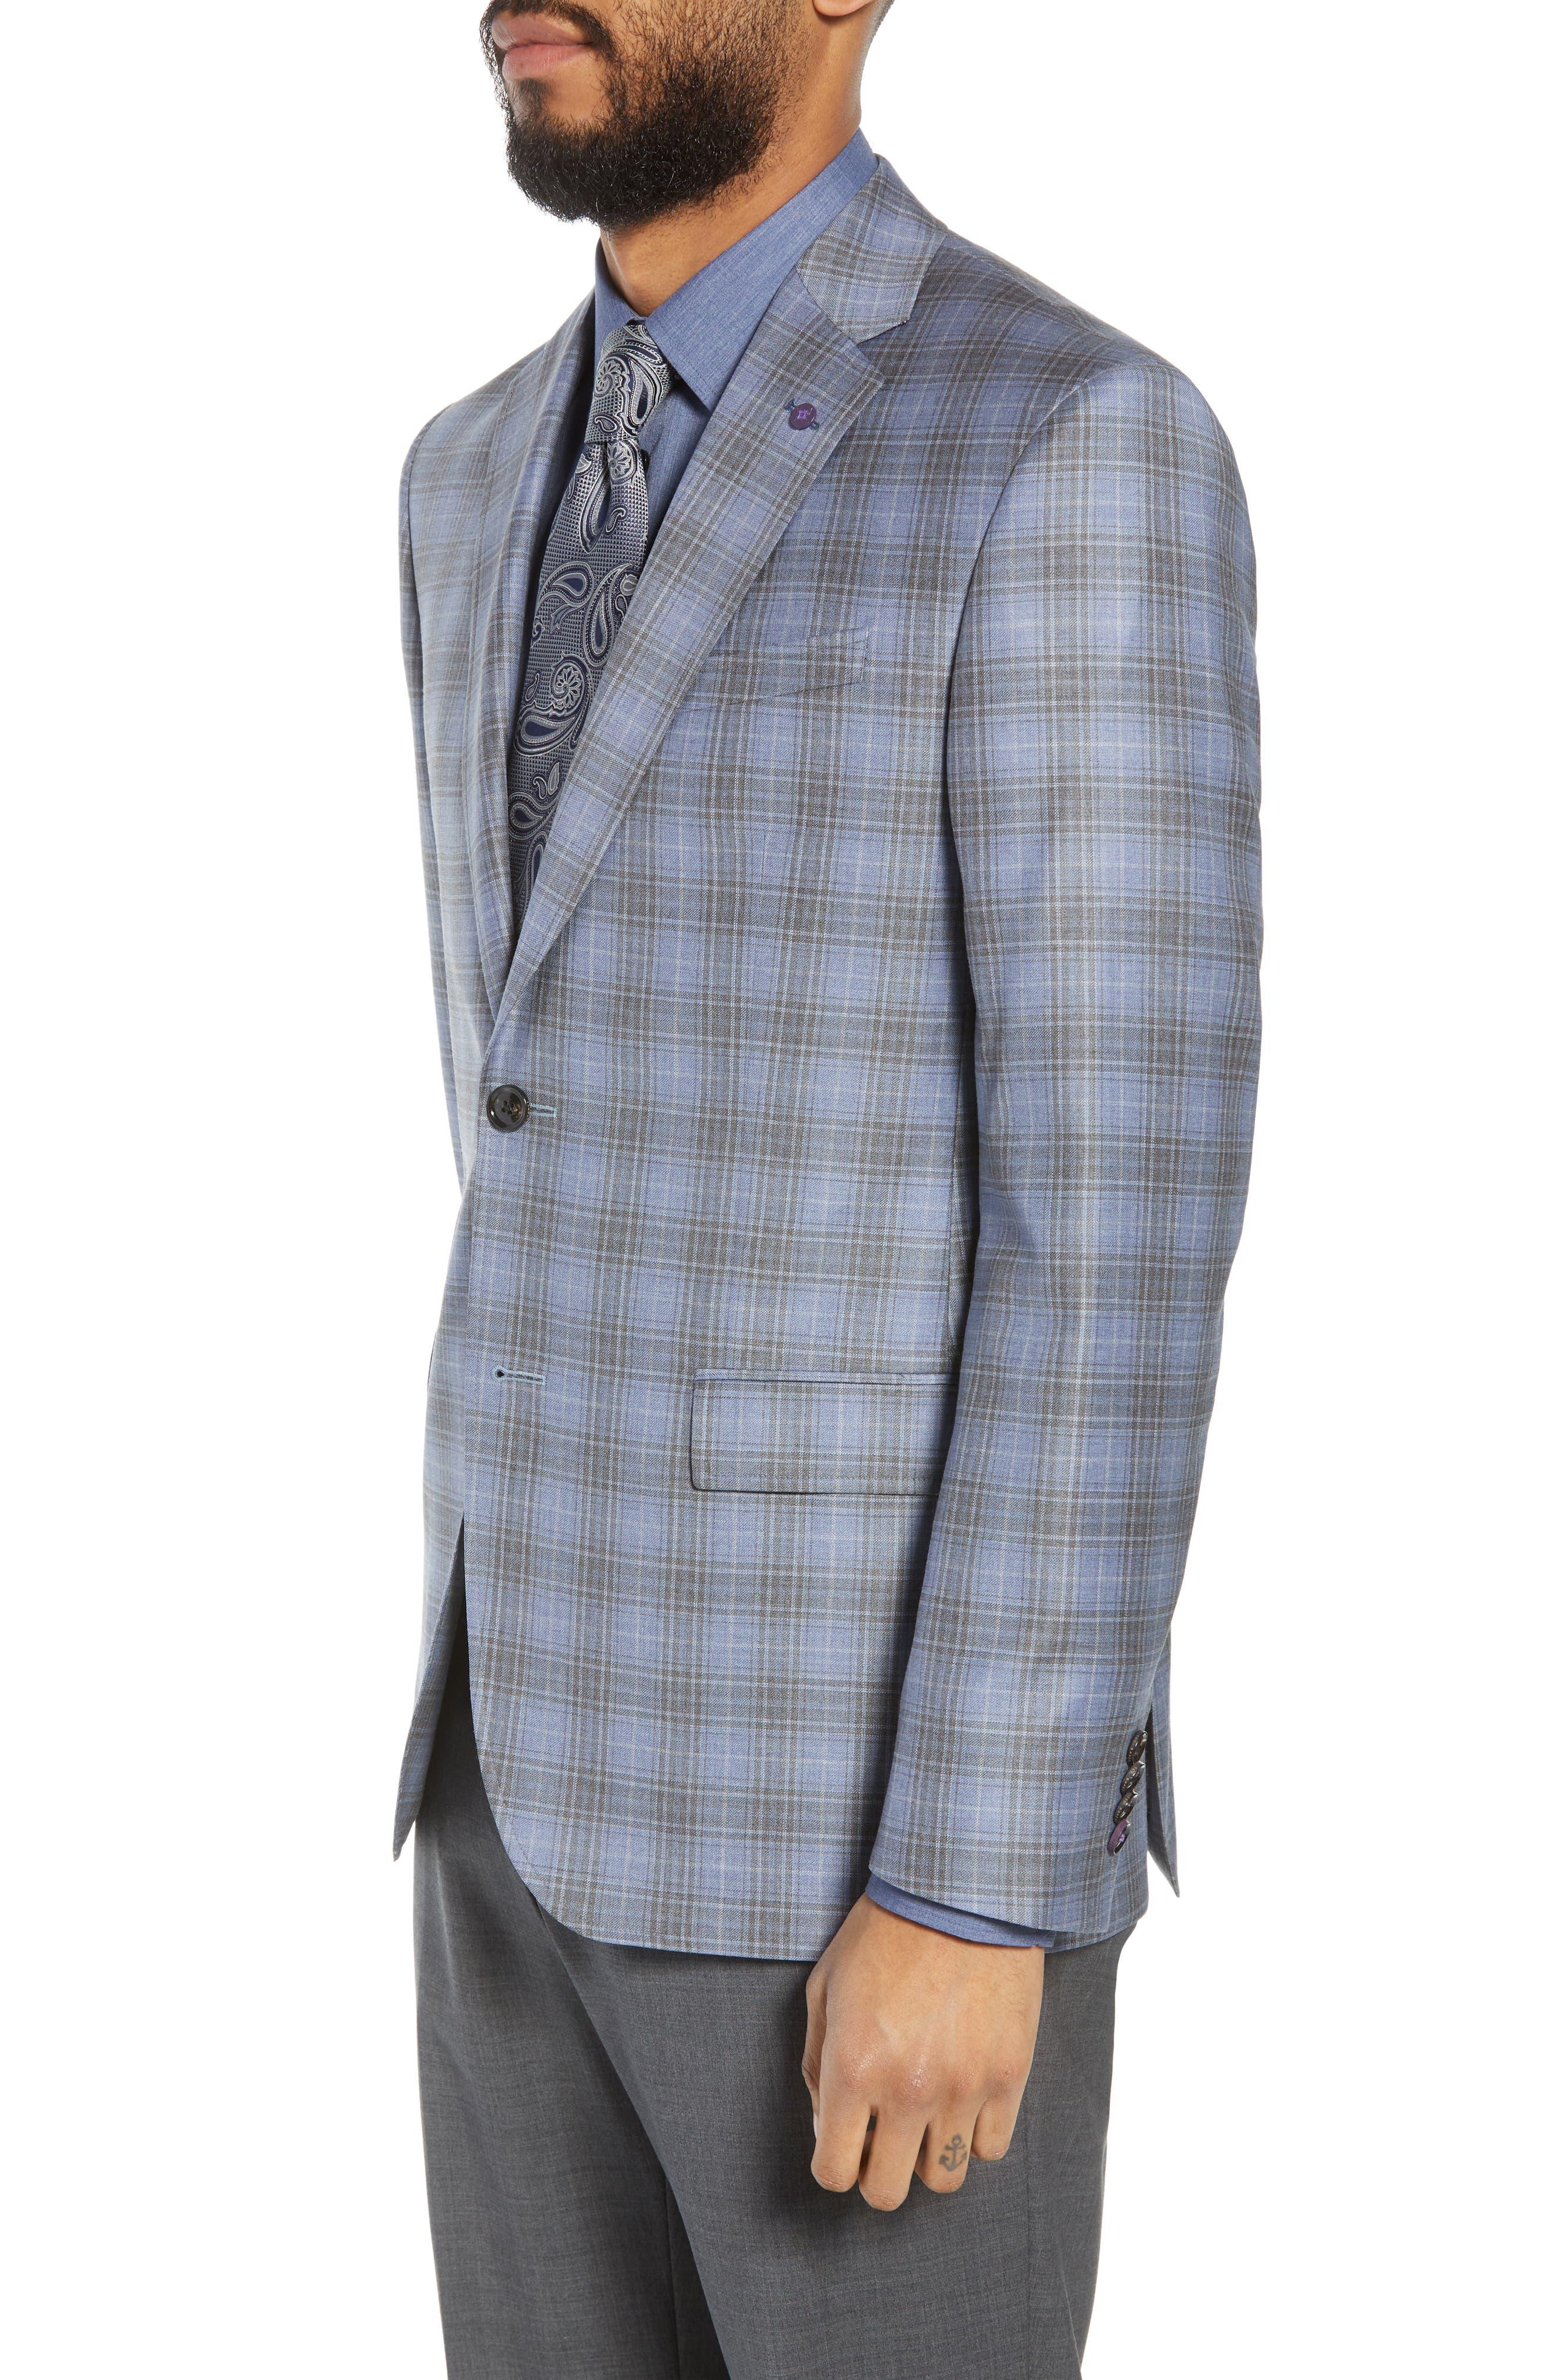 Jay Trim Fit Plaid Wool Sport Coat,                             Alternate thumbnail 3, color,                             Light Blue